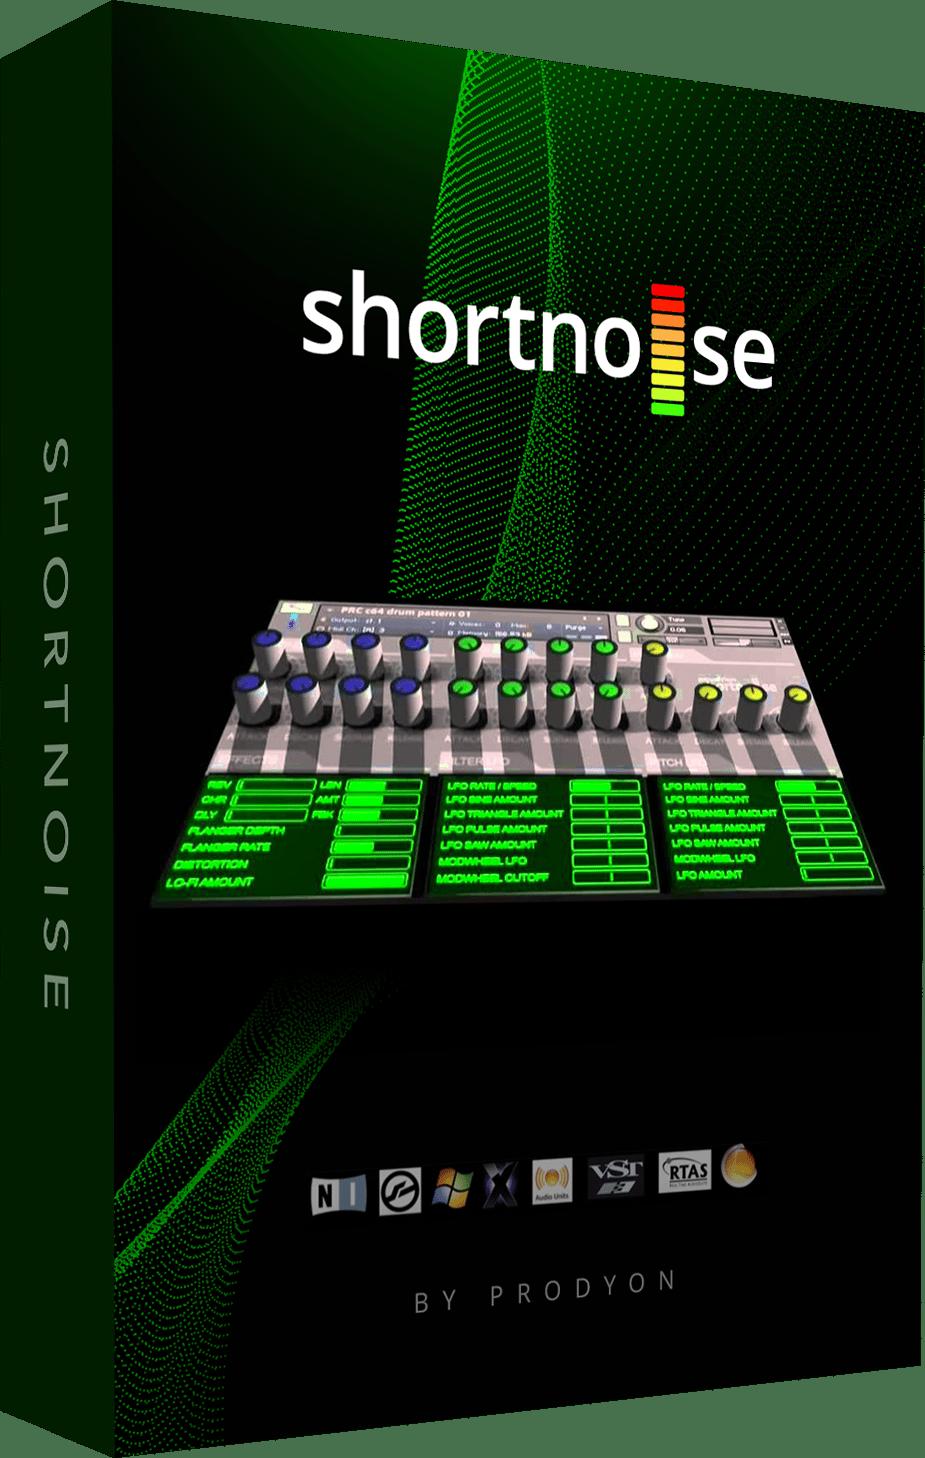 Shortnoise - Free 6GB Electronic Sample Library